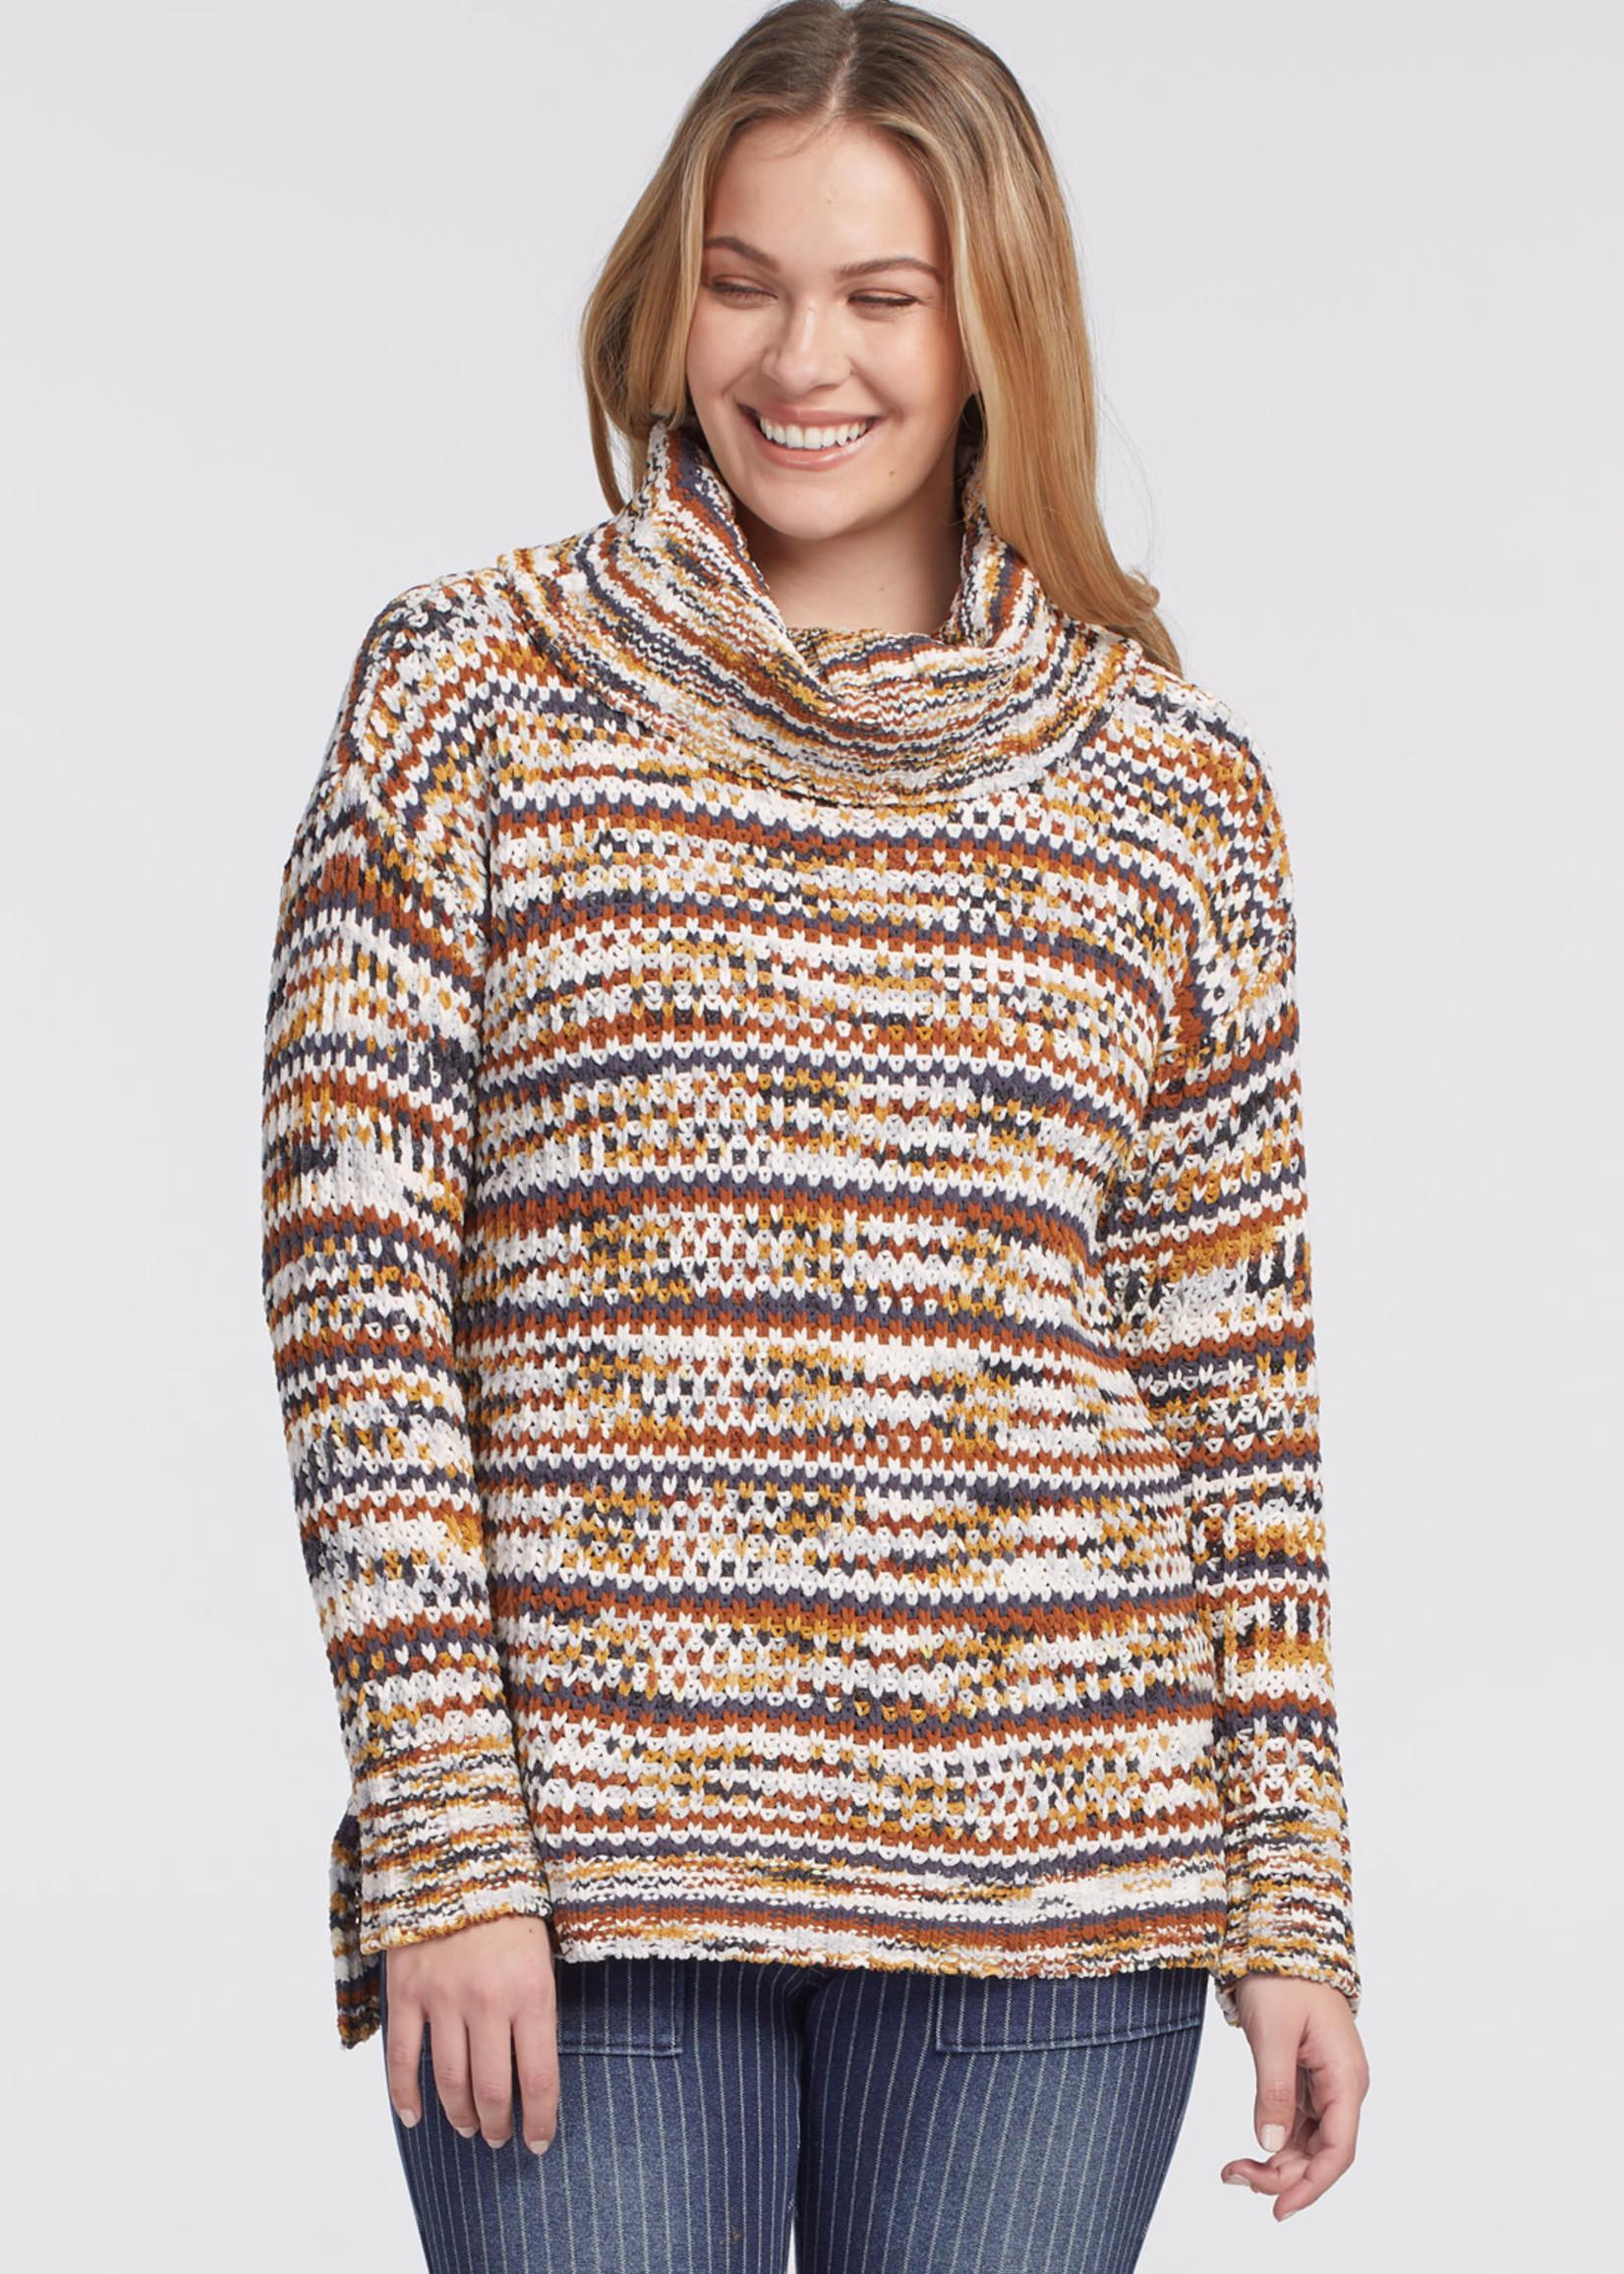 Tribal Long Sleeve Cowl Neck Sweater 47770/3412